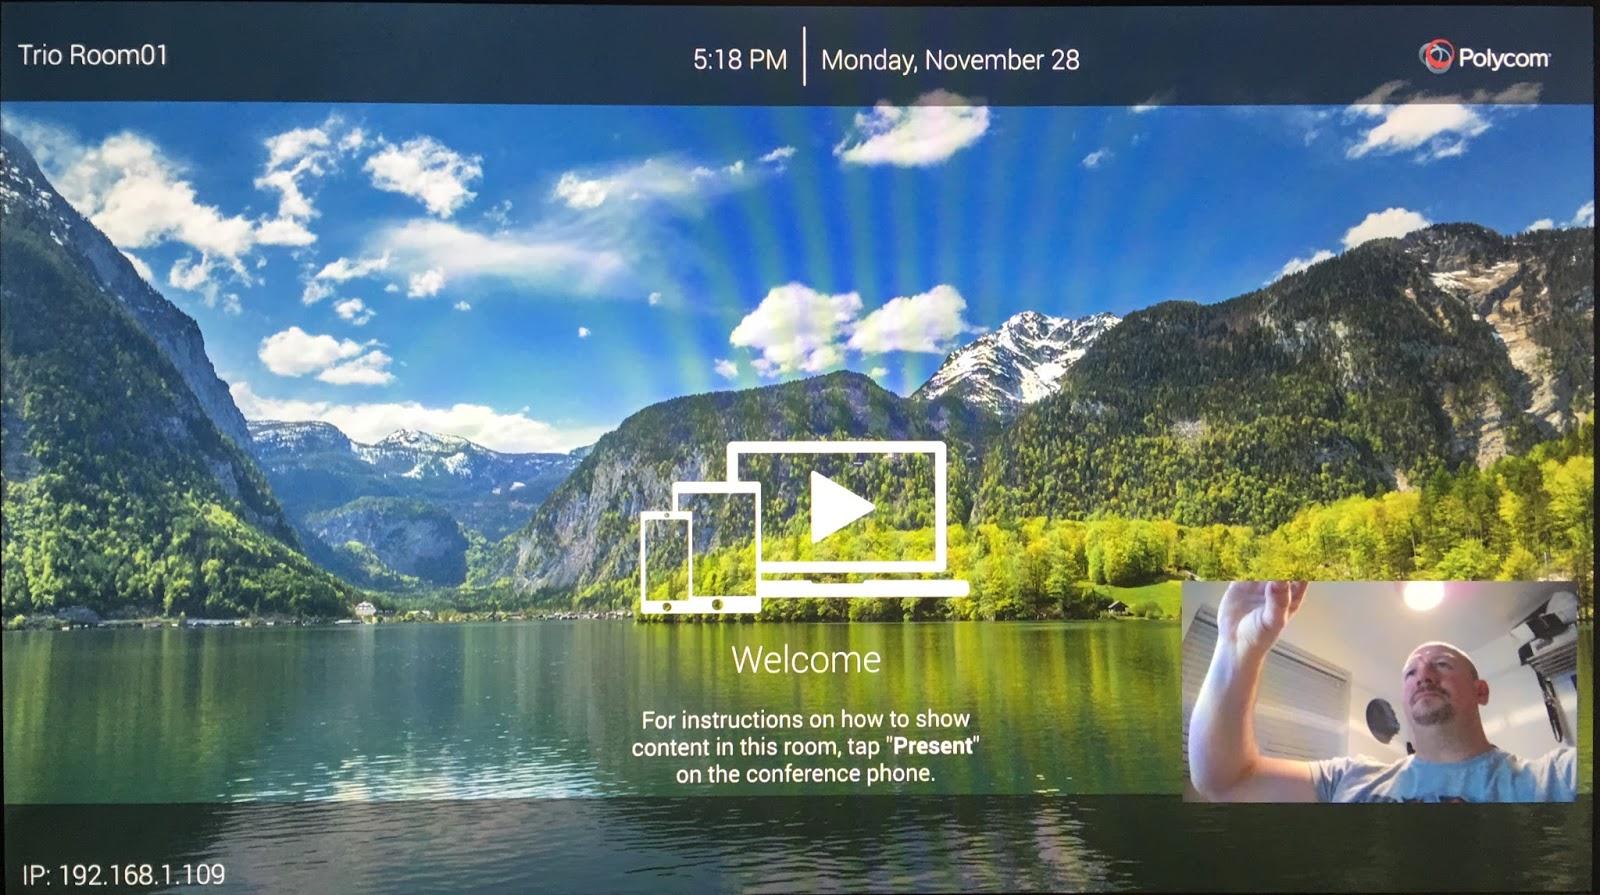 Randy's Lync, Skype, Teams and UC Blog: Hands On with the Polycom